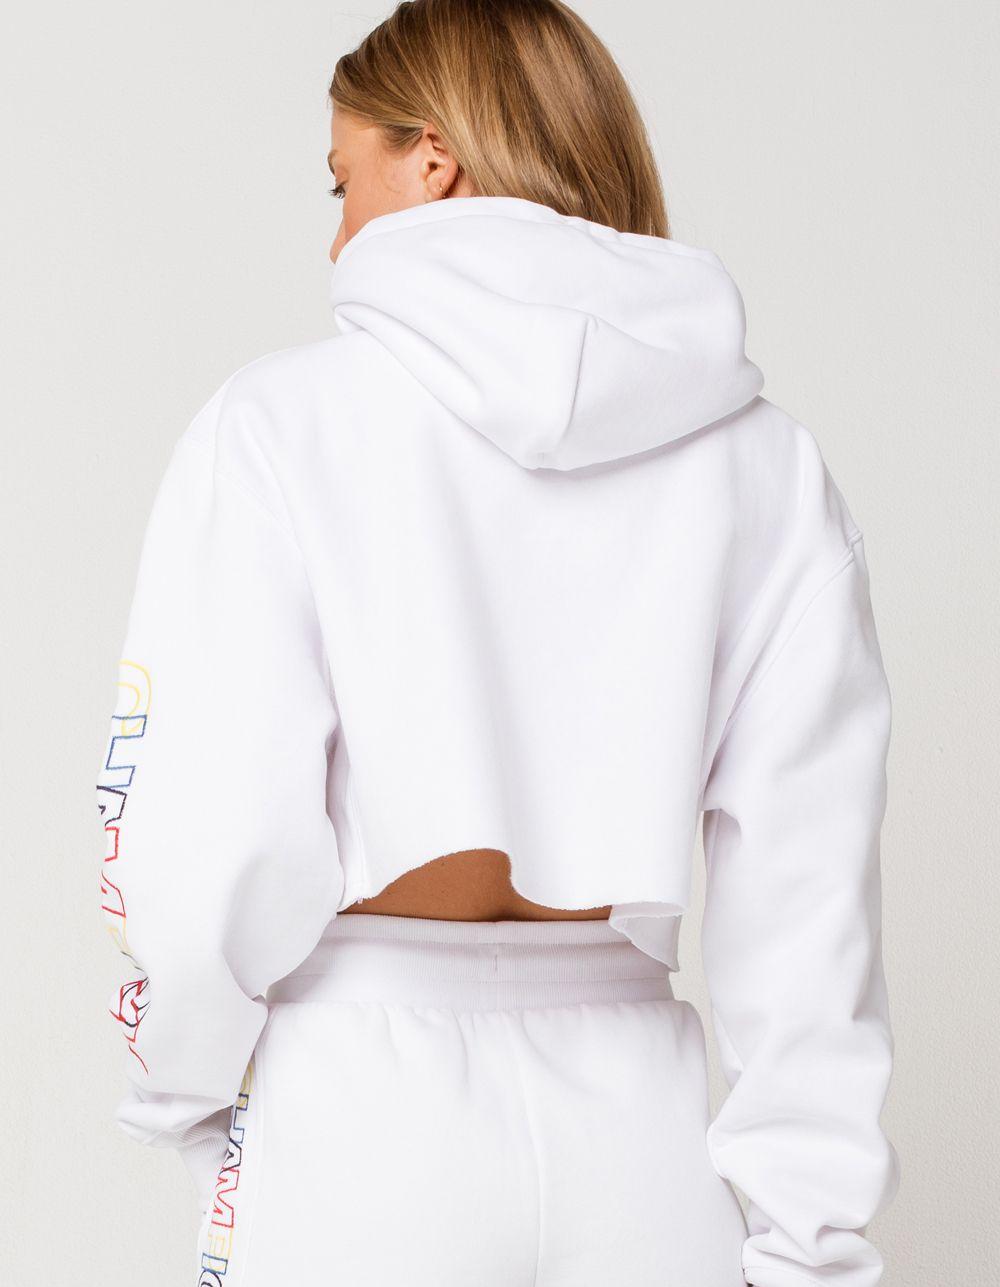 Champion Reverse Weave Womens Cropped Hoodie White 359954150 Cropped Hoodie Outfit Cropped Hoodie Champion Reverse Weave [ 1287 x 1000 Pixel ]